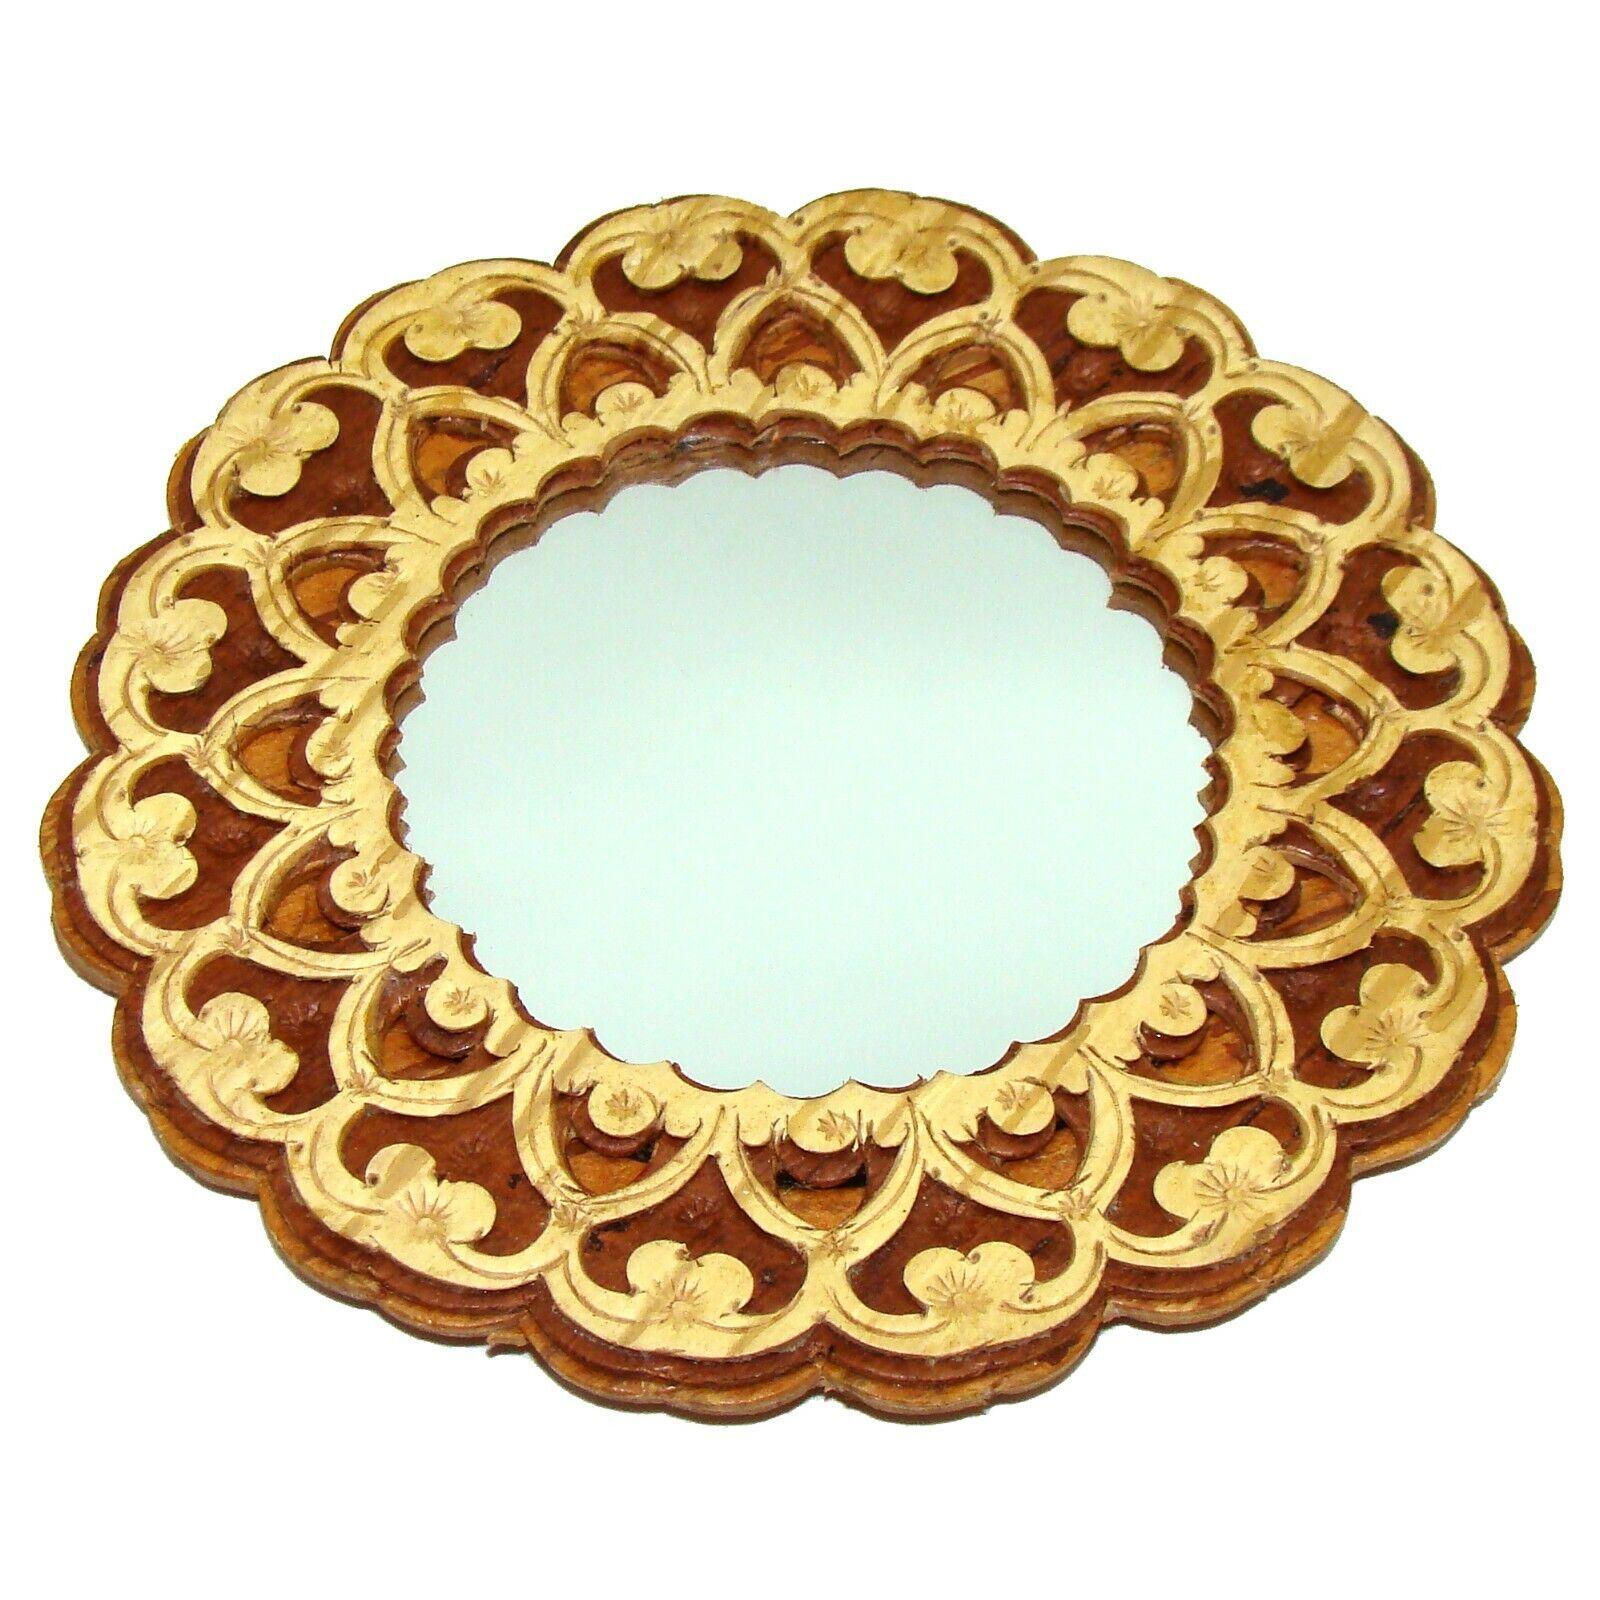 Miroir de sac original - Artisanat russe - Miroir collection en bois, écorce